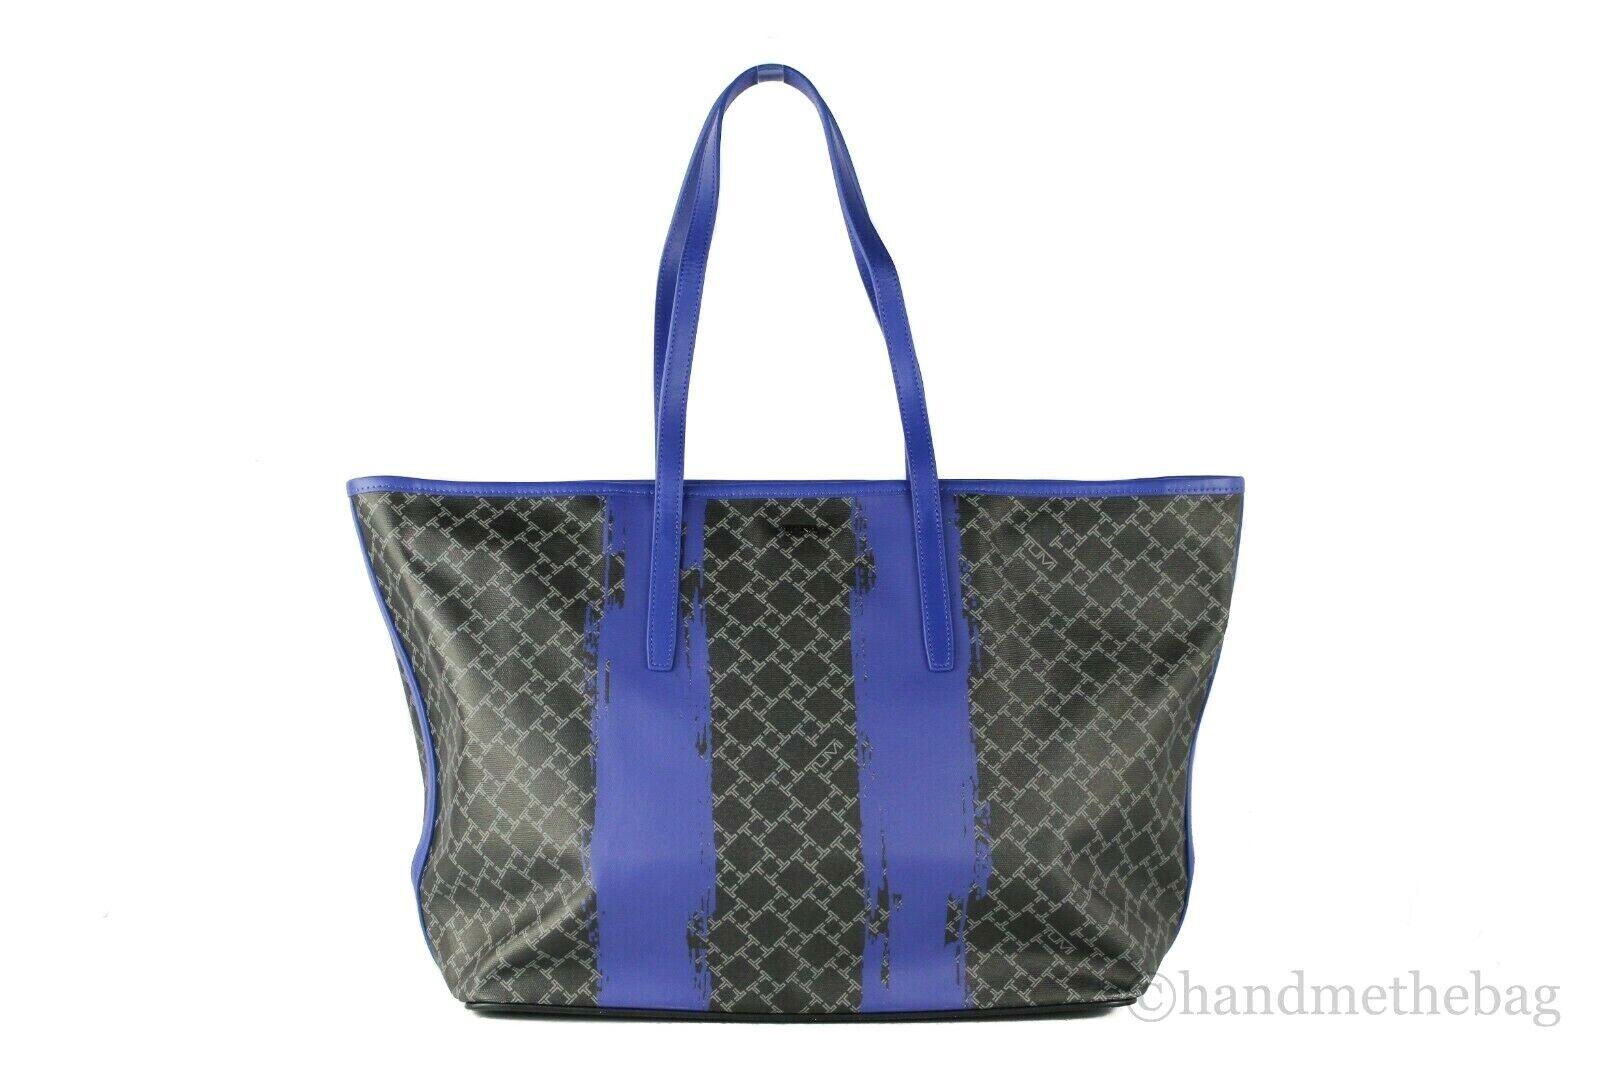 Tumi Everyday Large Coated Canvas Leather Shoulder Tote Bag Carryall Handbag Black/Blue